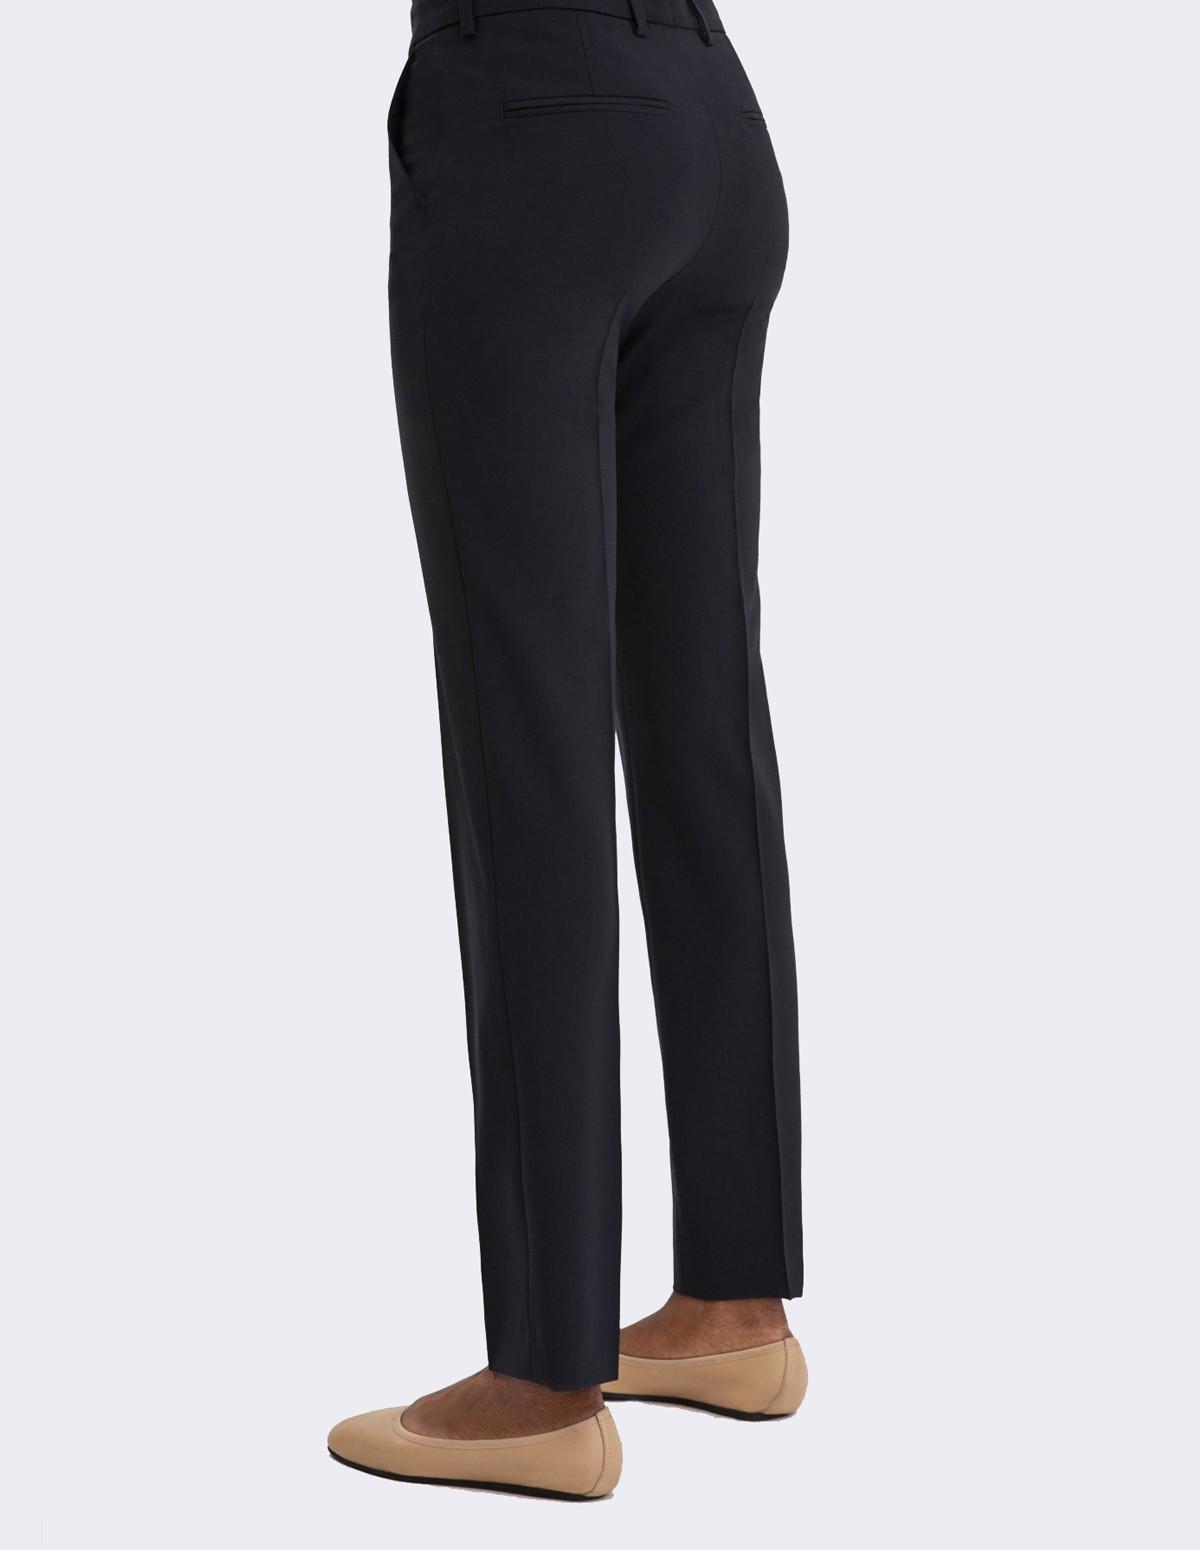 Fk Luisa Cool Wool Trouser